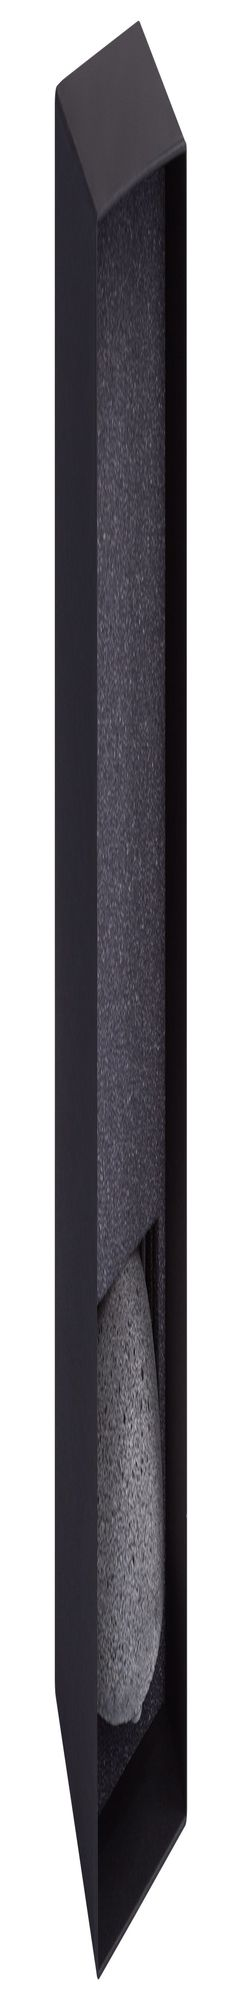 Наградная стела Moon Globe темно-серая фото